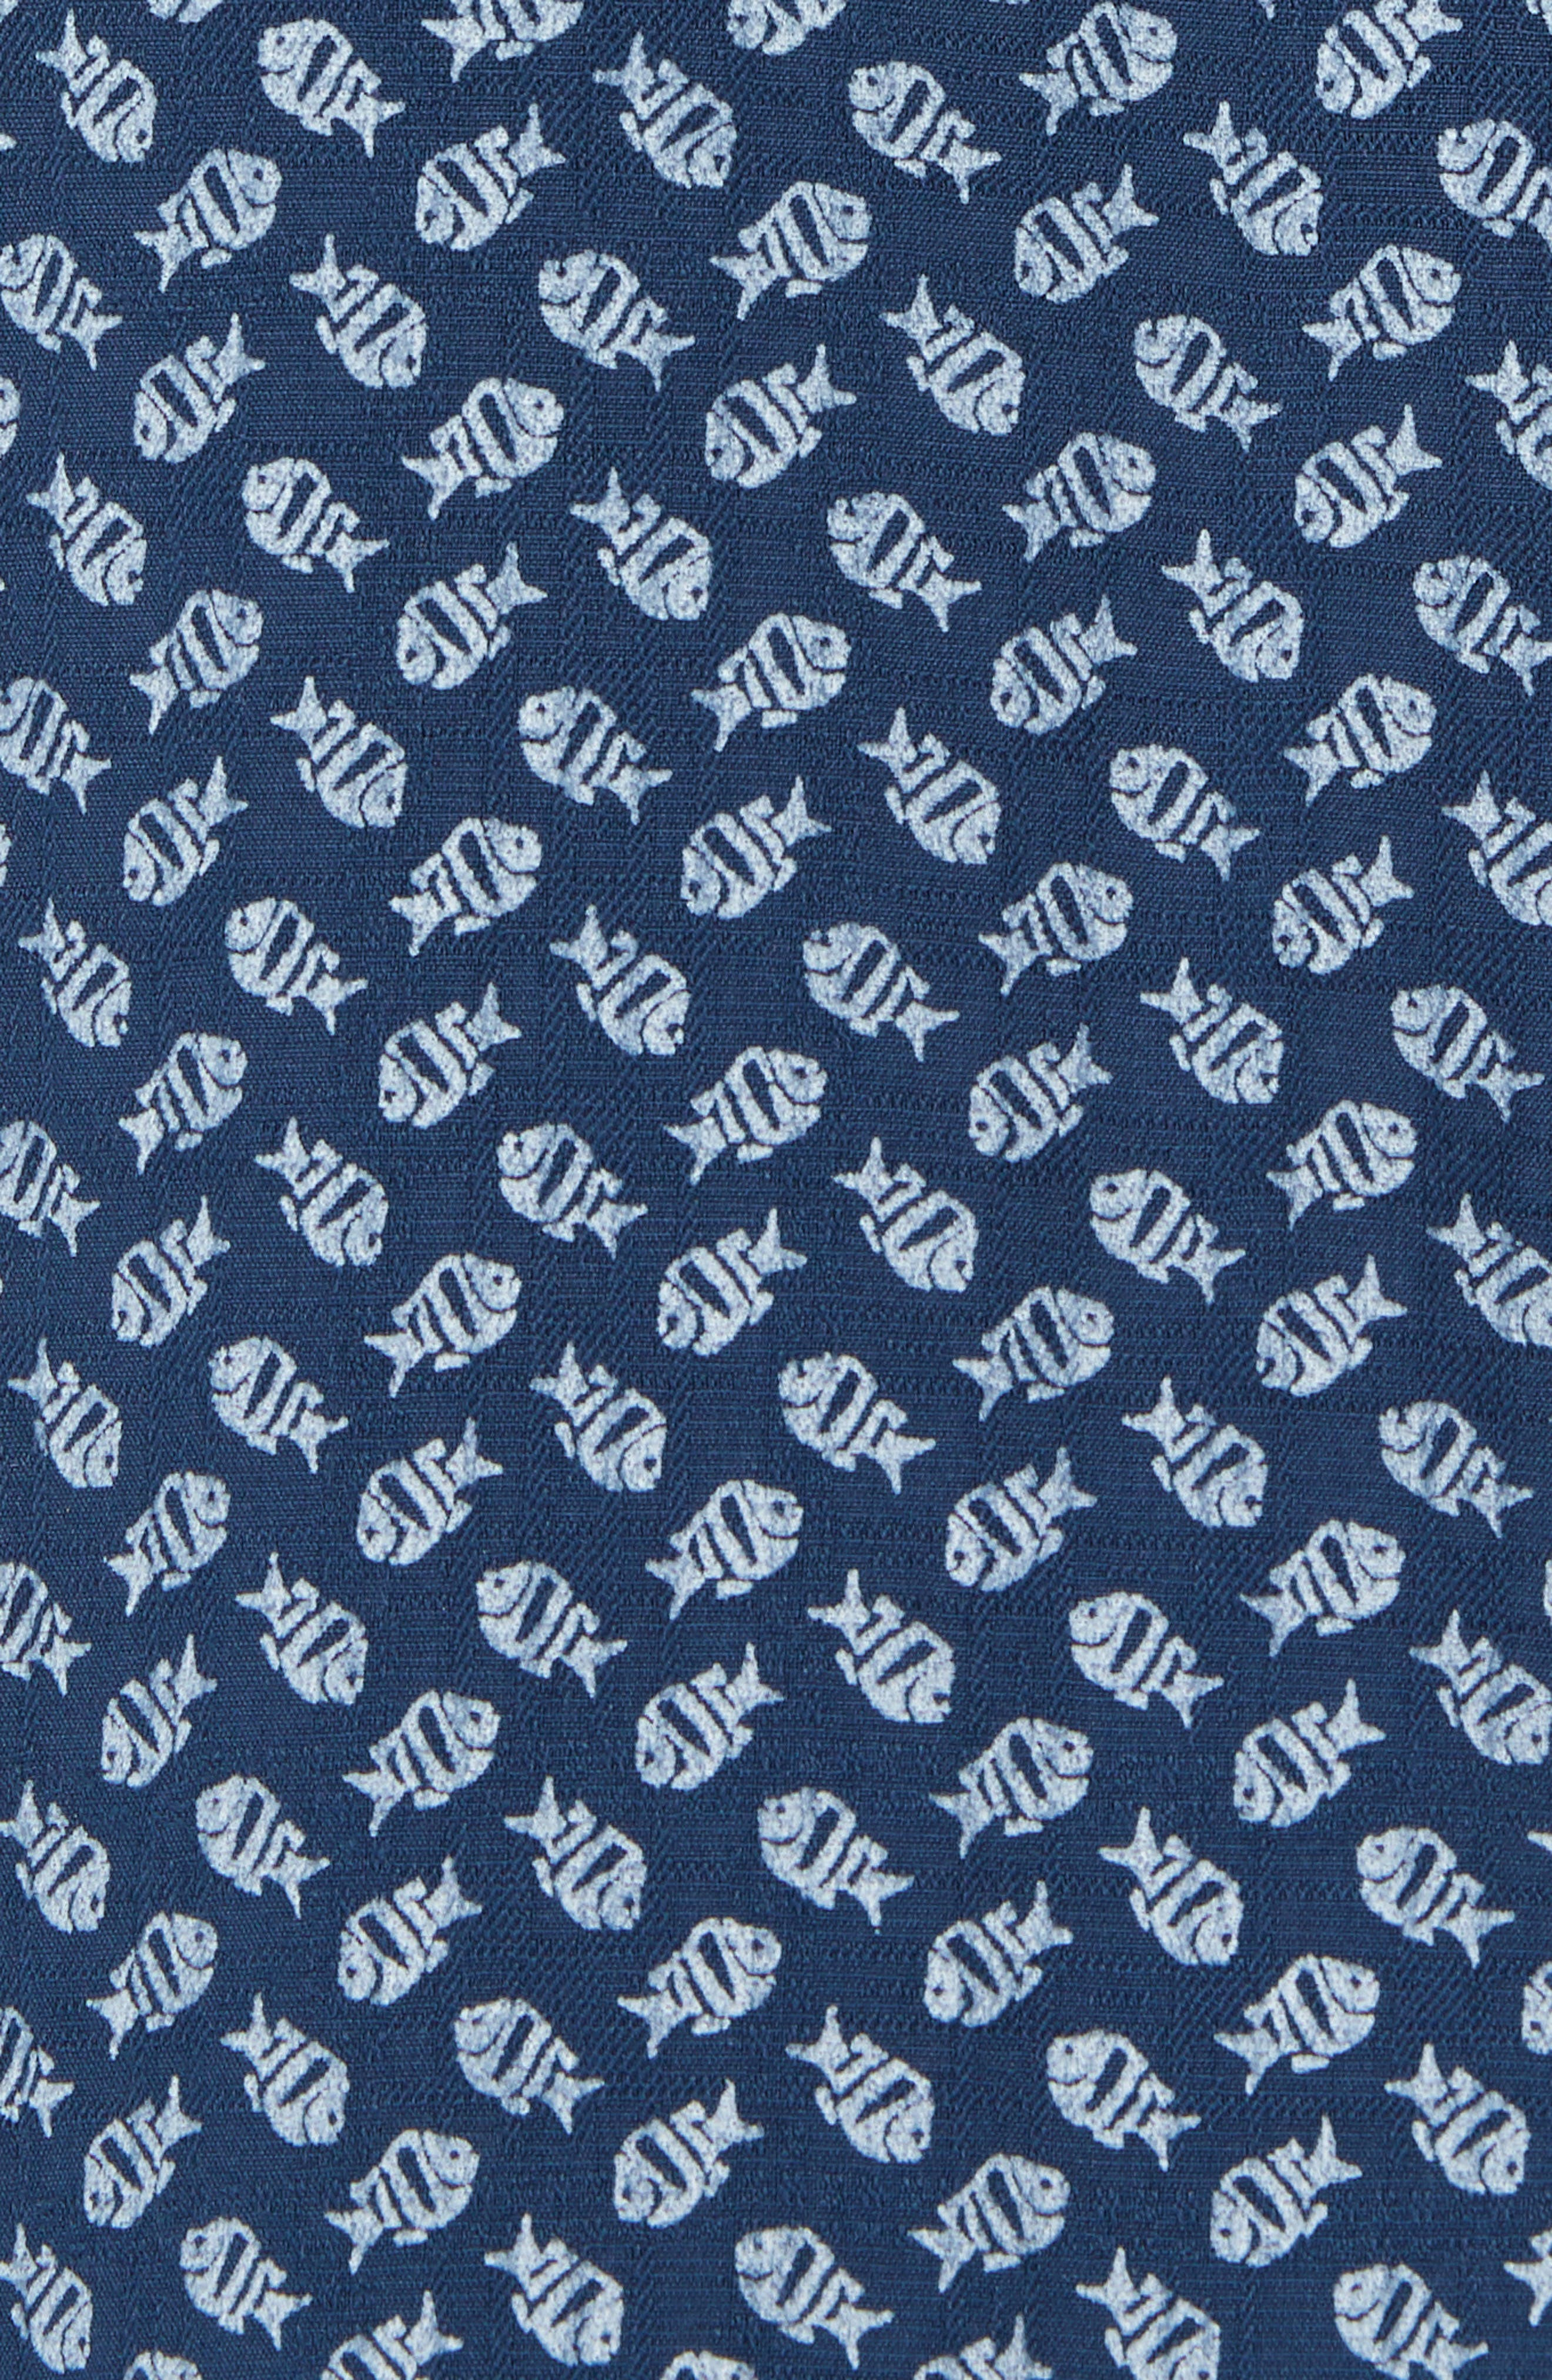 A-fish-ianado Cotton & Silk Camp Shirt,                             Alternate thumbnail 5, color,                             Ocean Deep